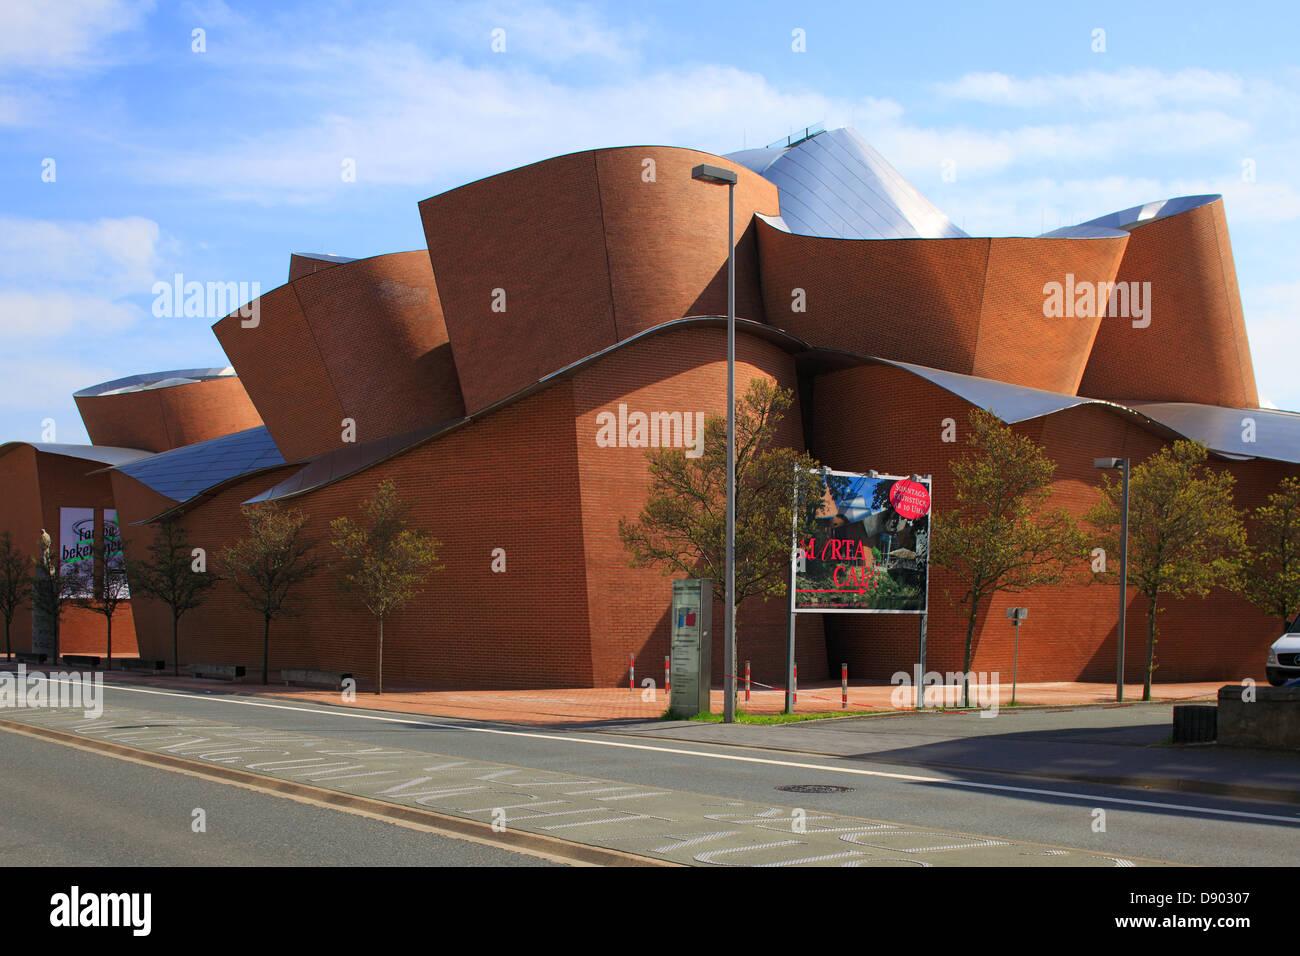 Kunstmuseum MARTa des Architekten Frank Gehry in Herford, Ravensberger Land, Nordrhein-Westfalen - Stock Image